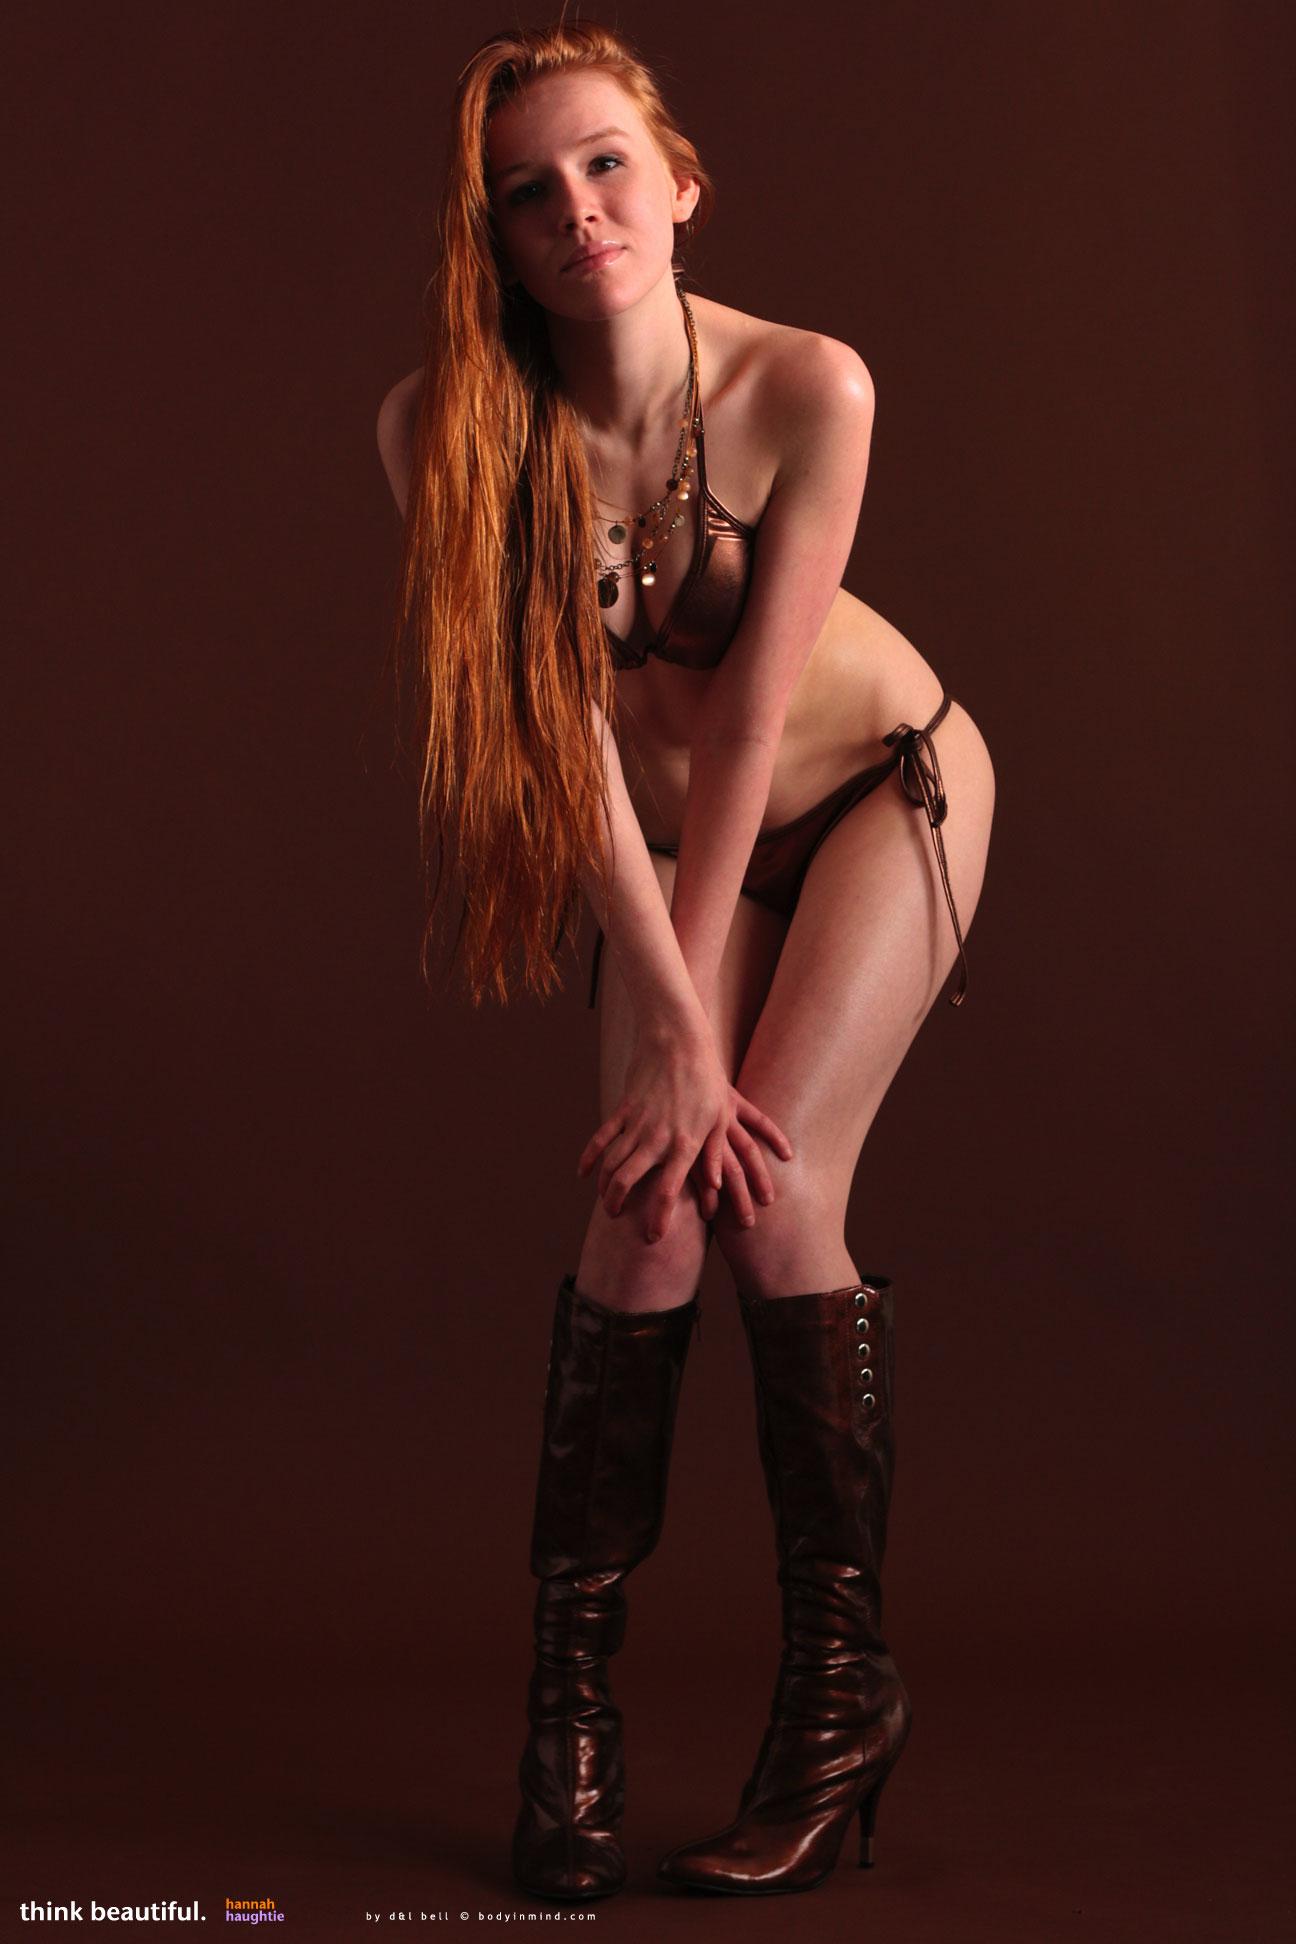 hannah-long-hair-redhead-naked-young-bodyinmind-03